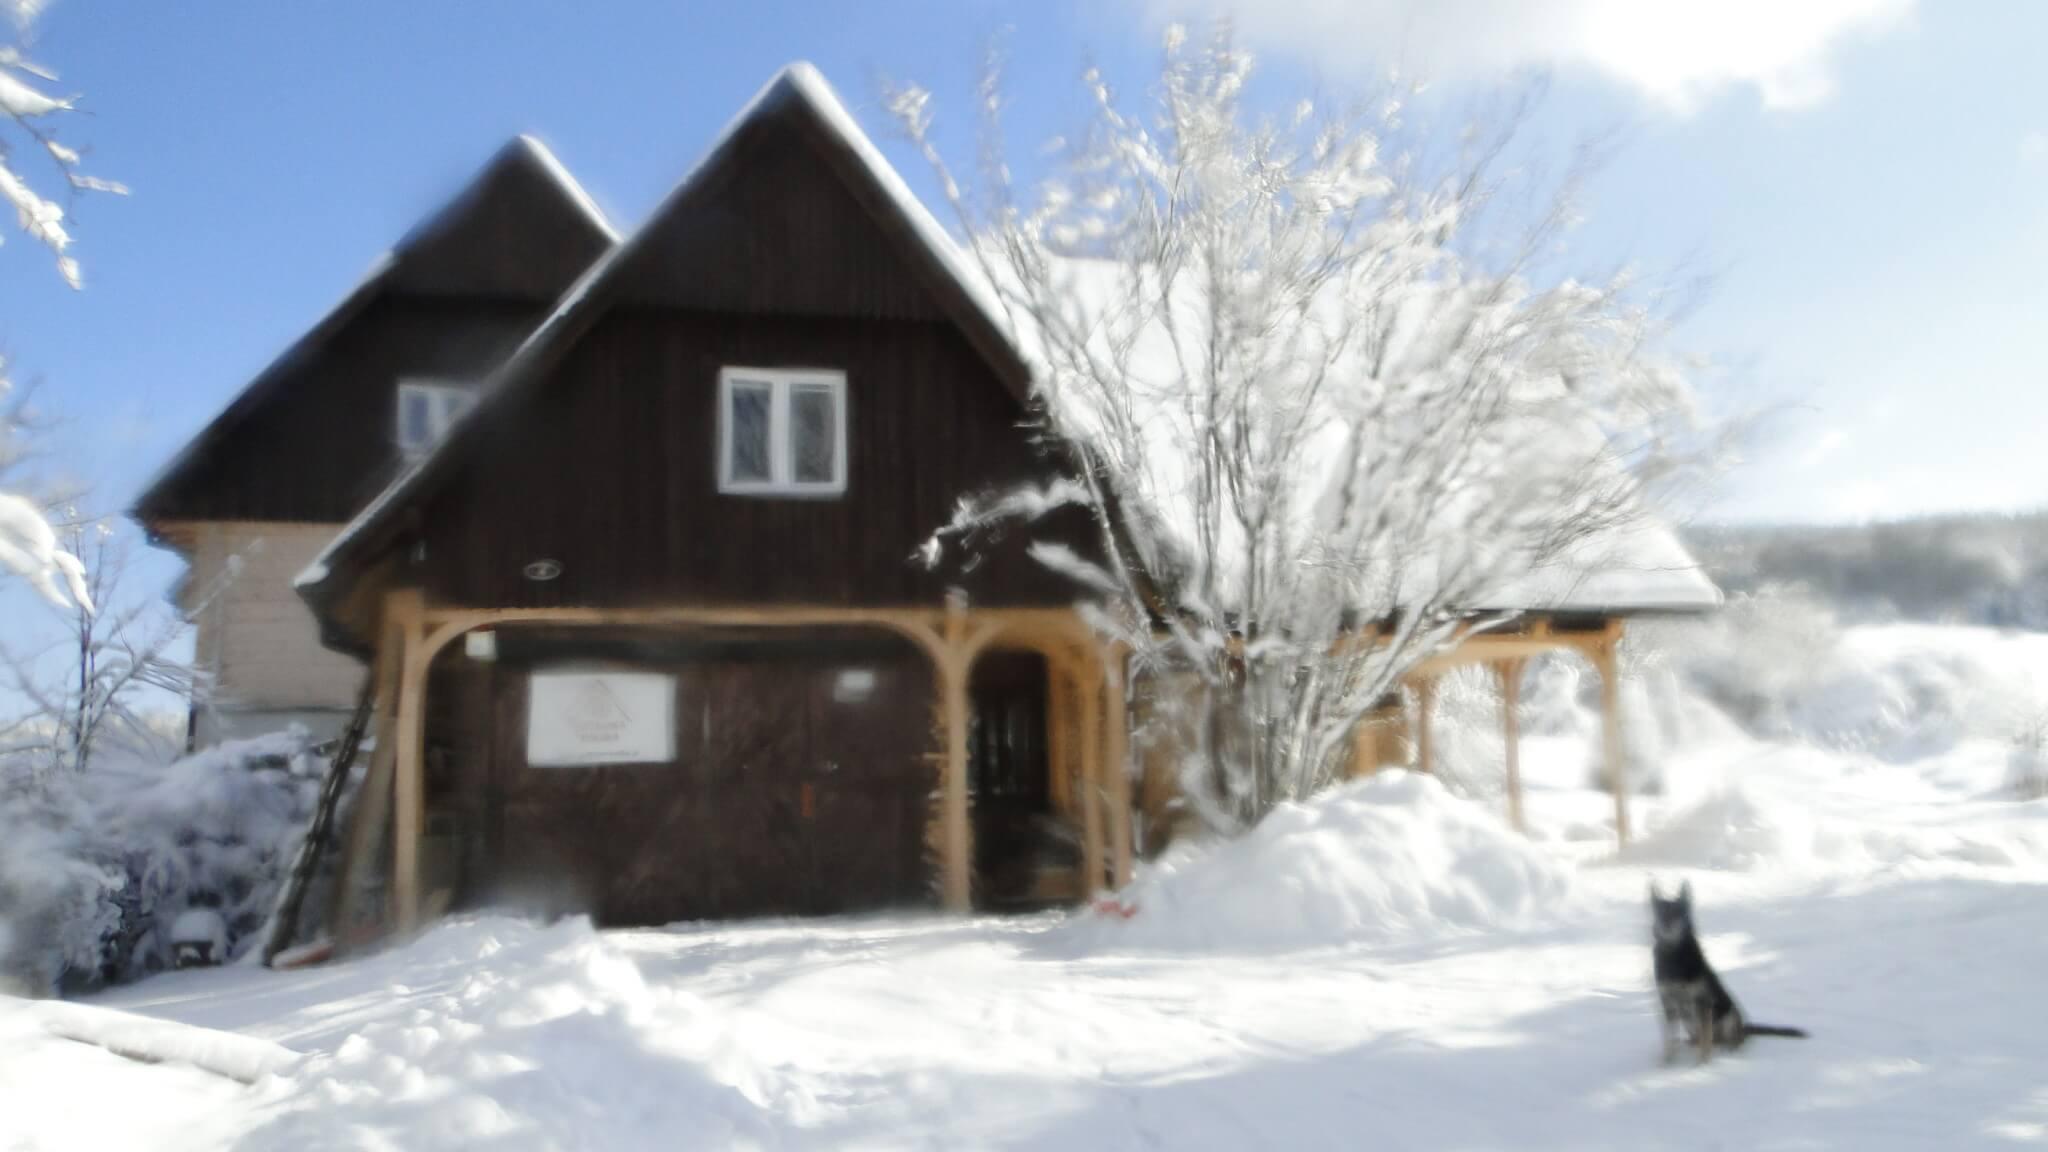 Lutowa zima - śnieżna i mroźna 14